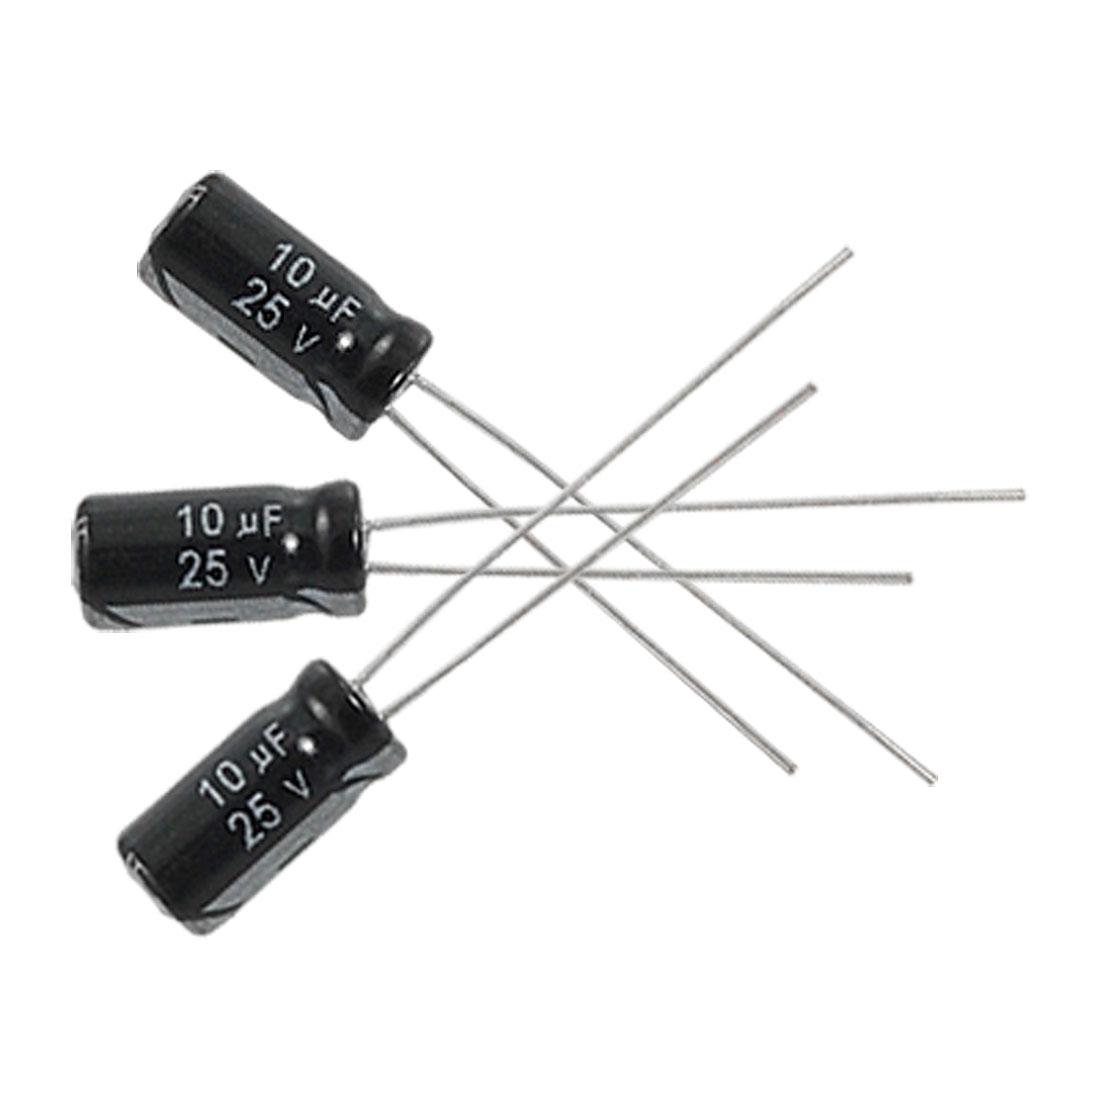 20 Pcs 5x11mm 10uF 20% 25V 105C Radial Aluminum Electrolytic Capacitor